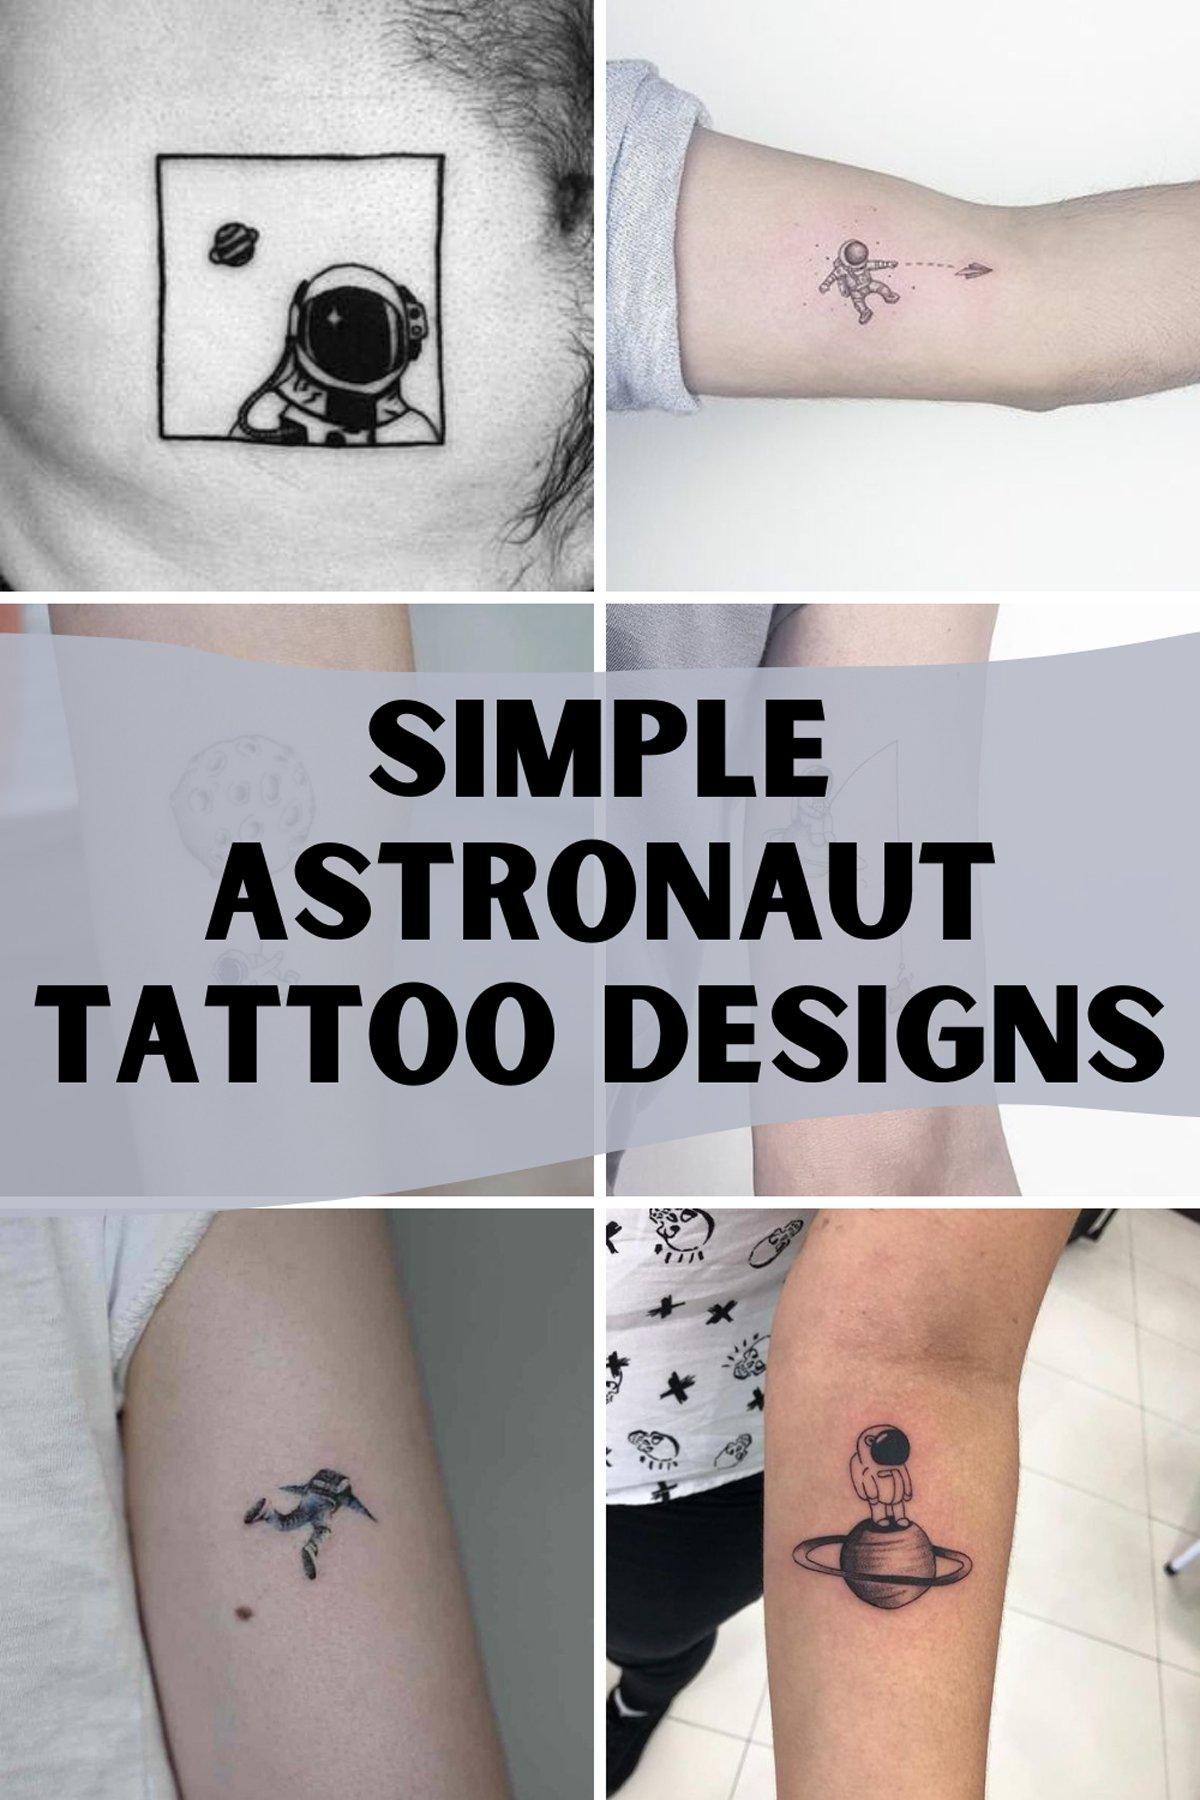 Simple Astronaut Tattoo